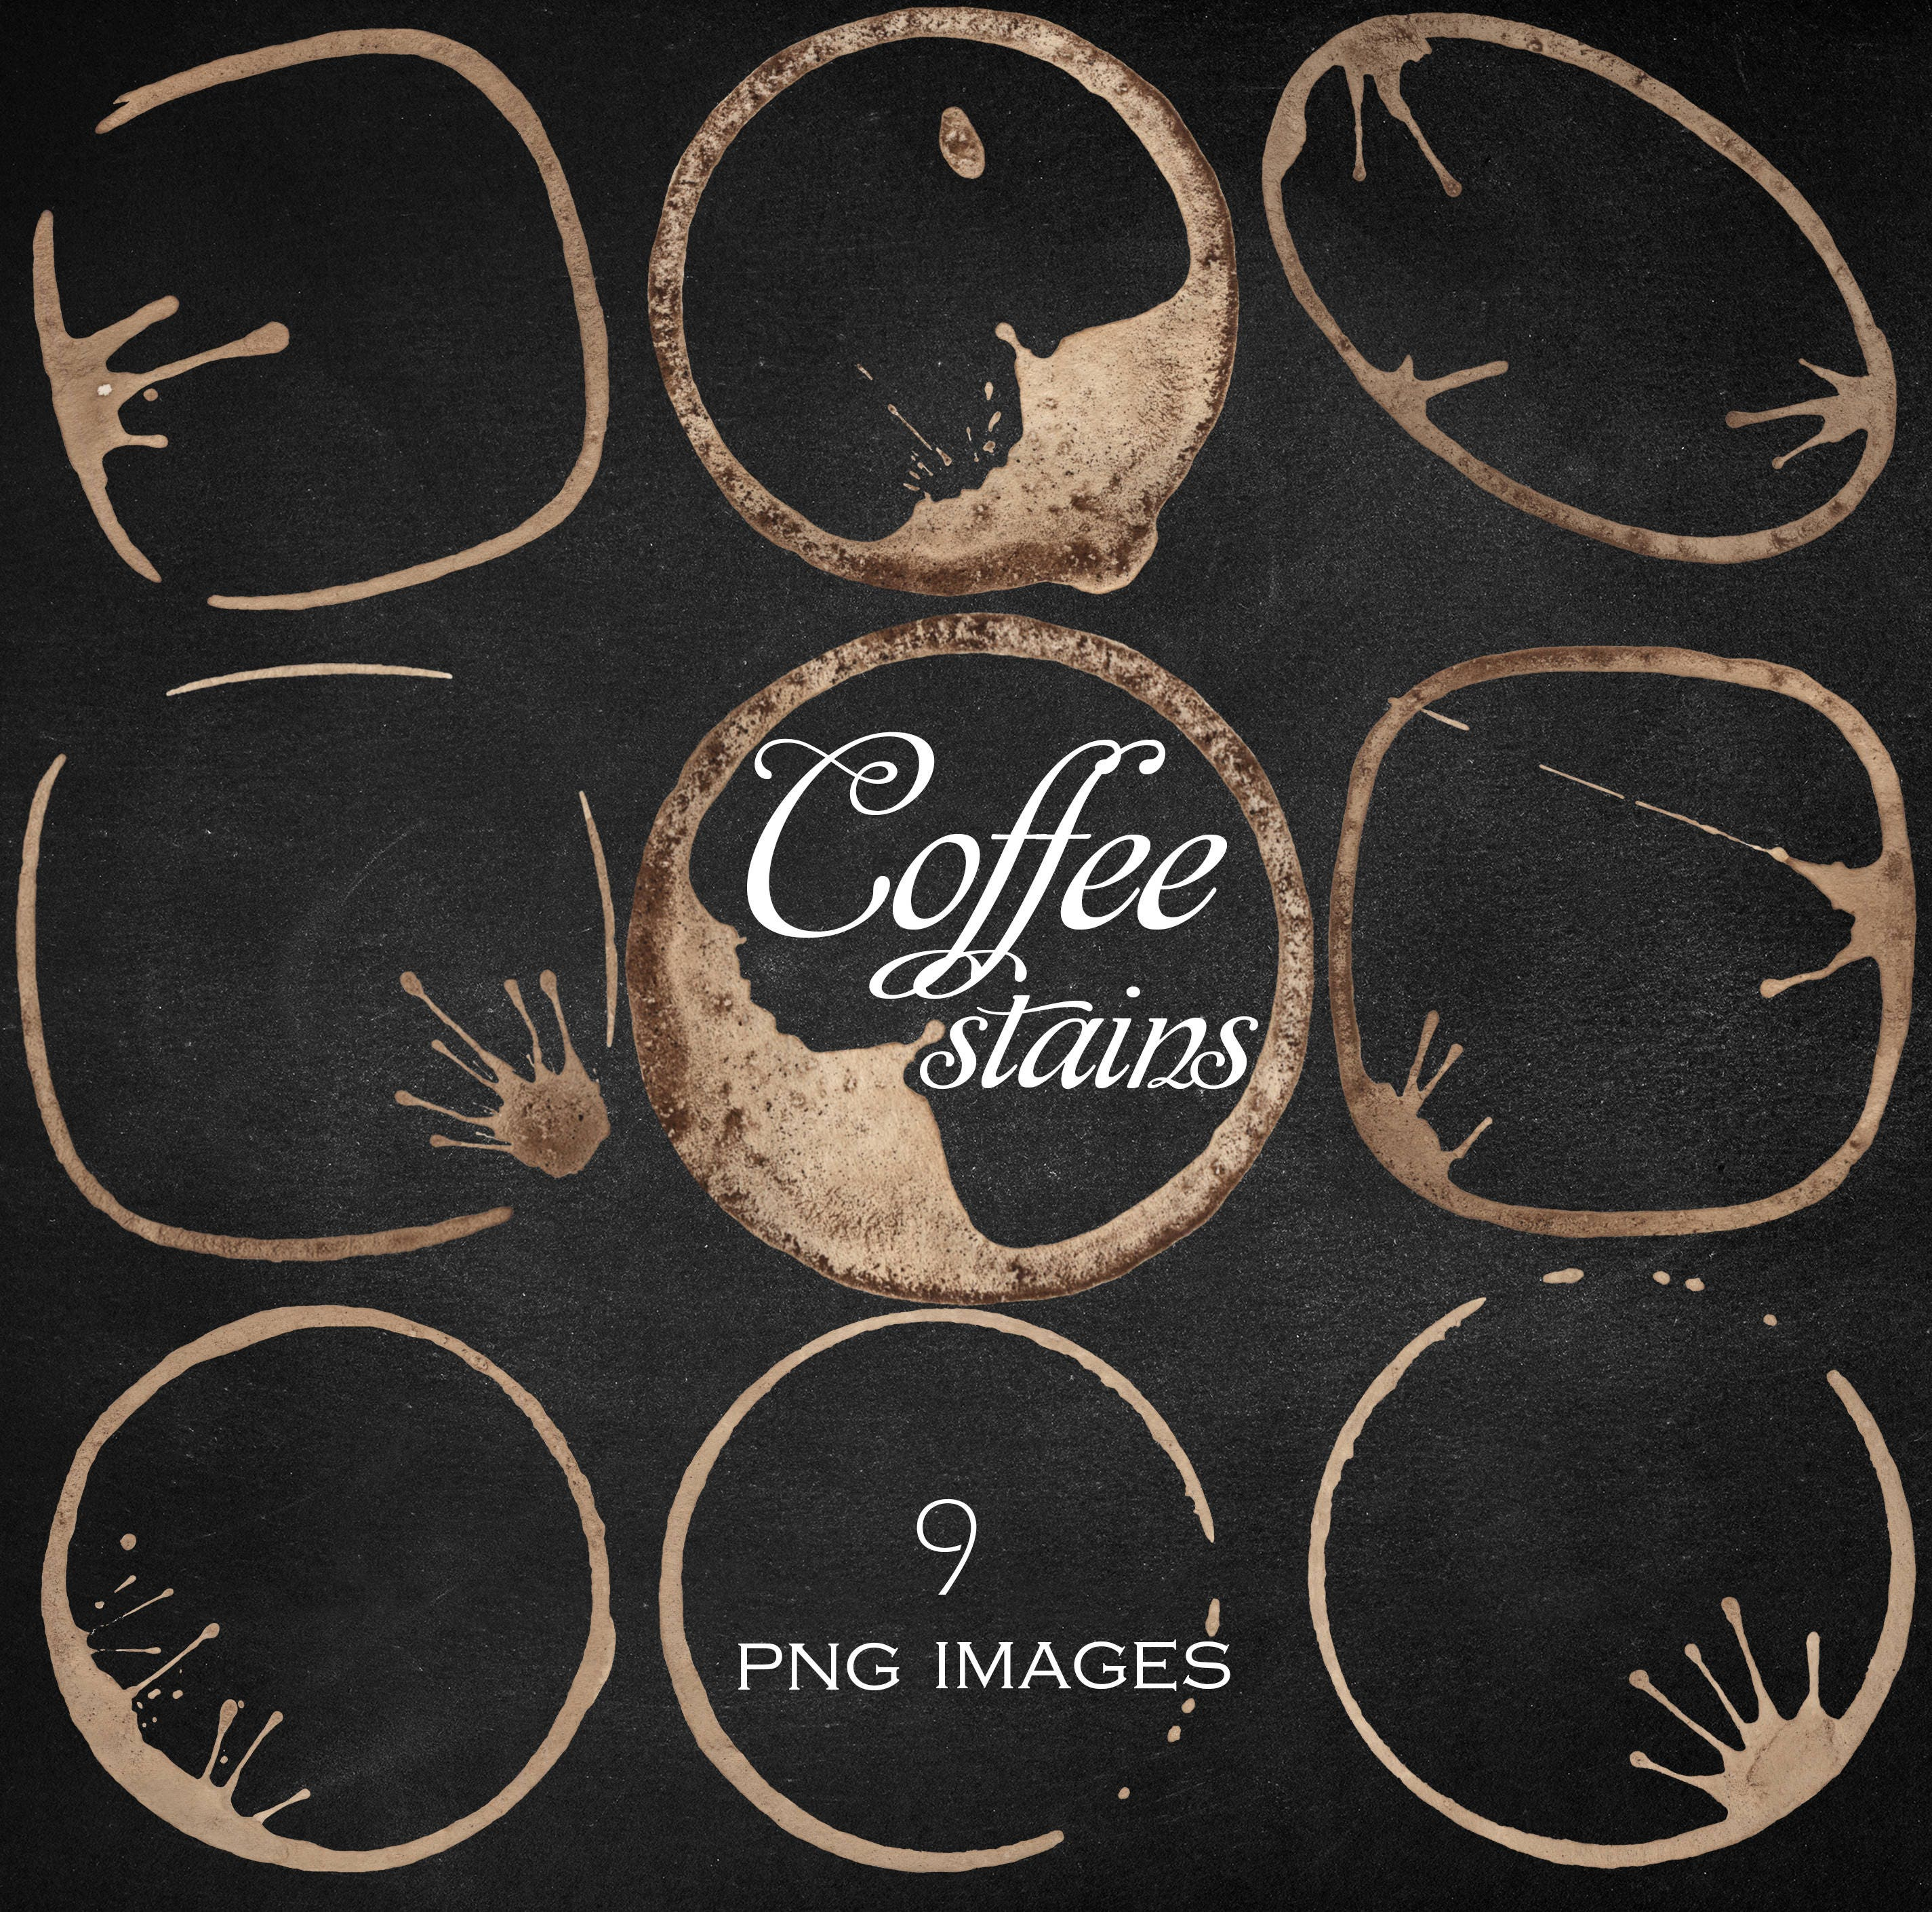 clipart caf images png les taches de caf les taches de. Black Bedroom Furniture Sets. Home Design Ideas